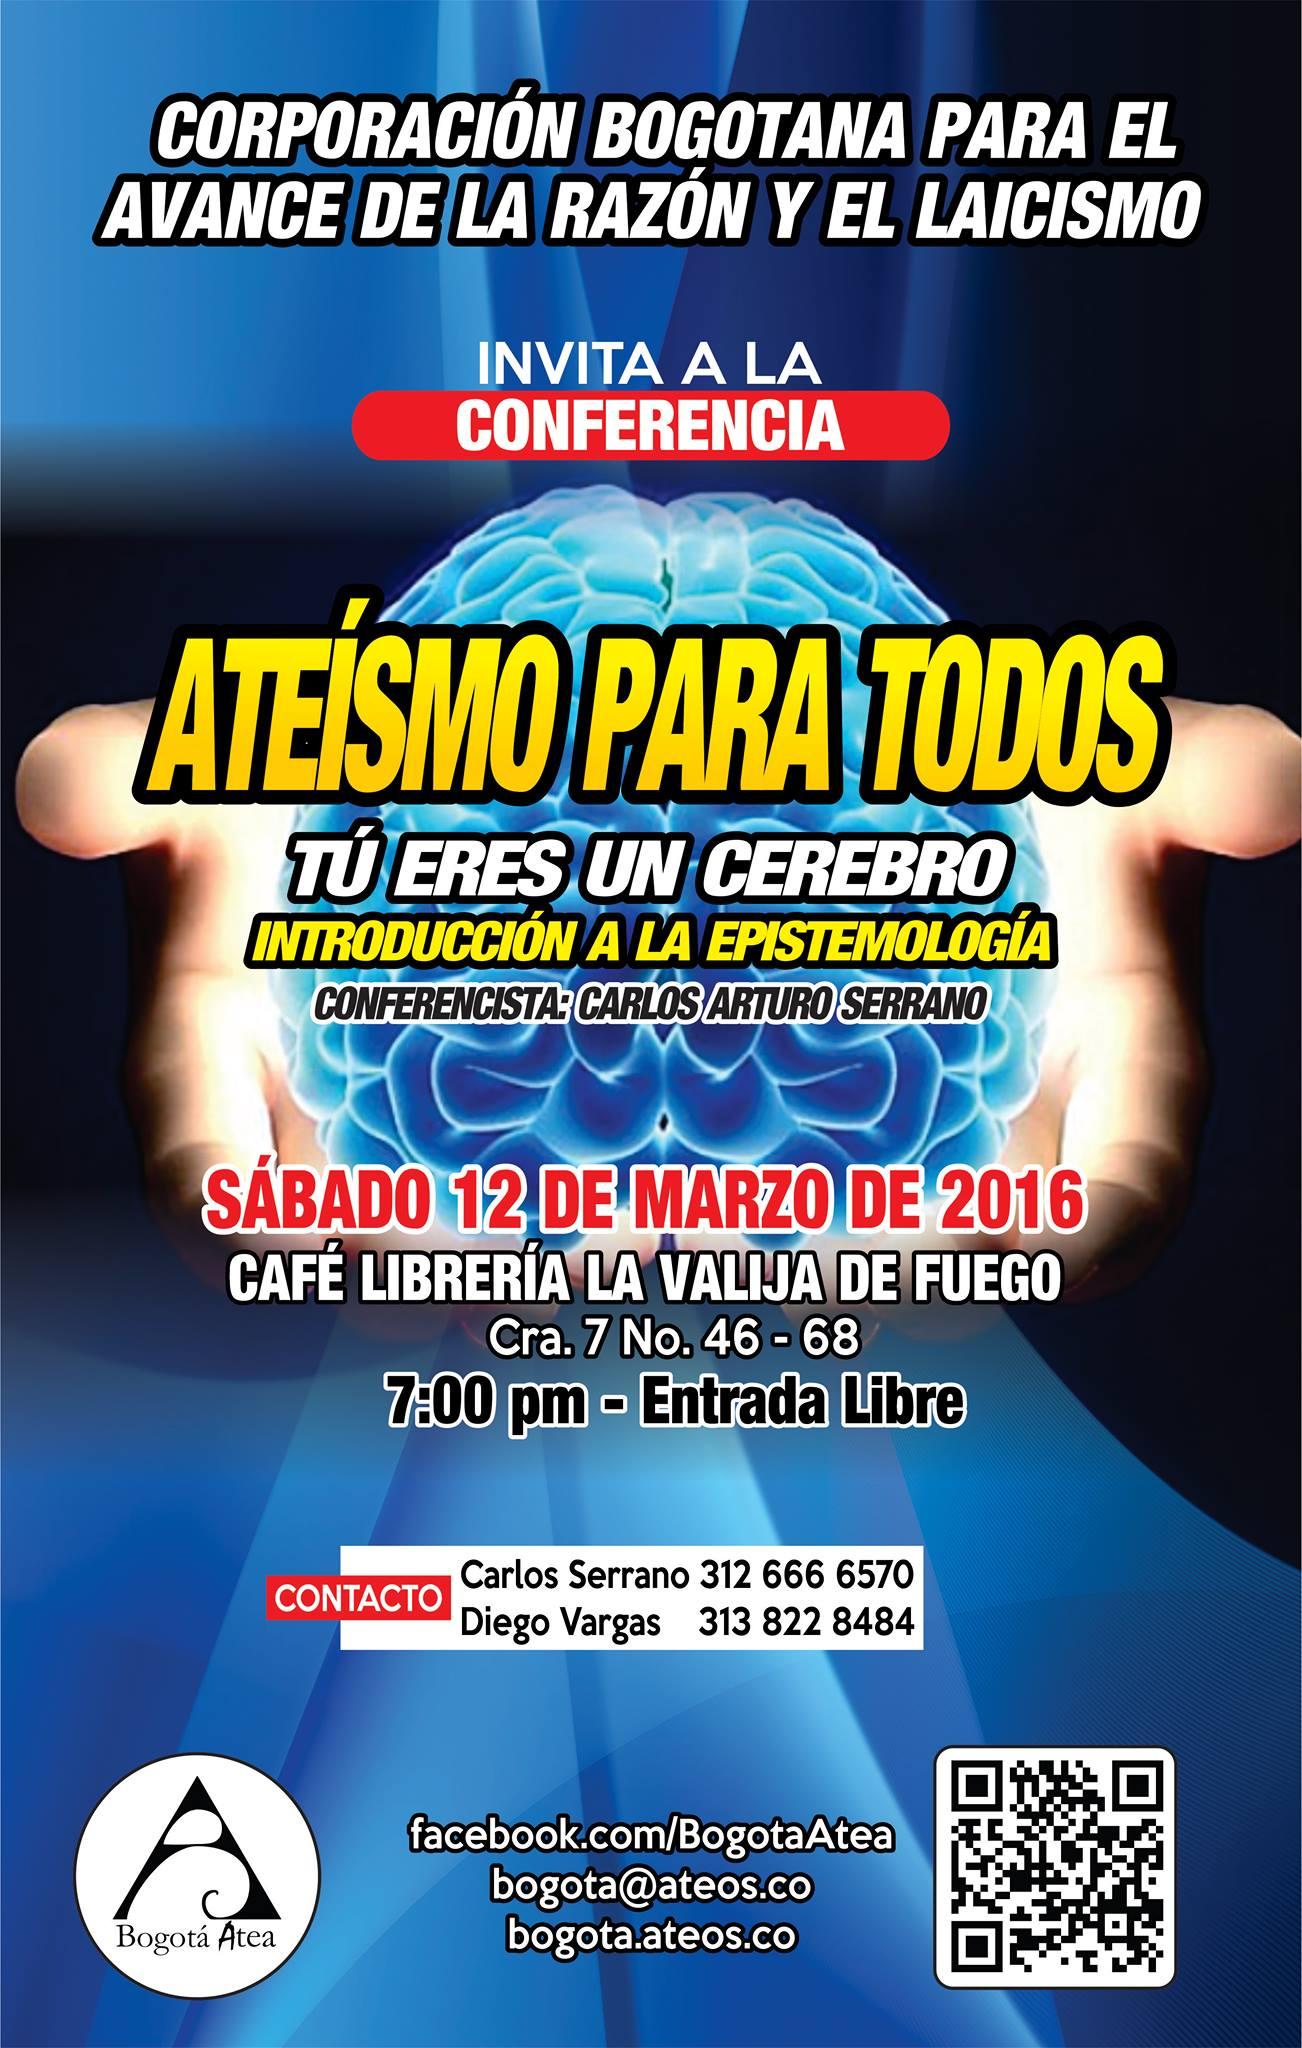 AteismoParaTodos-TuEresUnCerebro